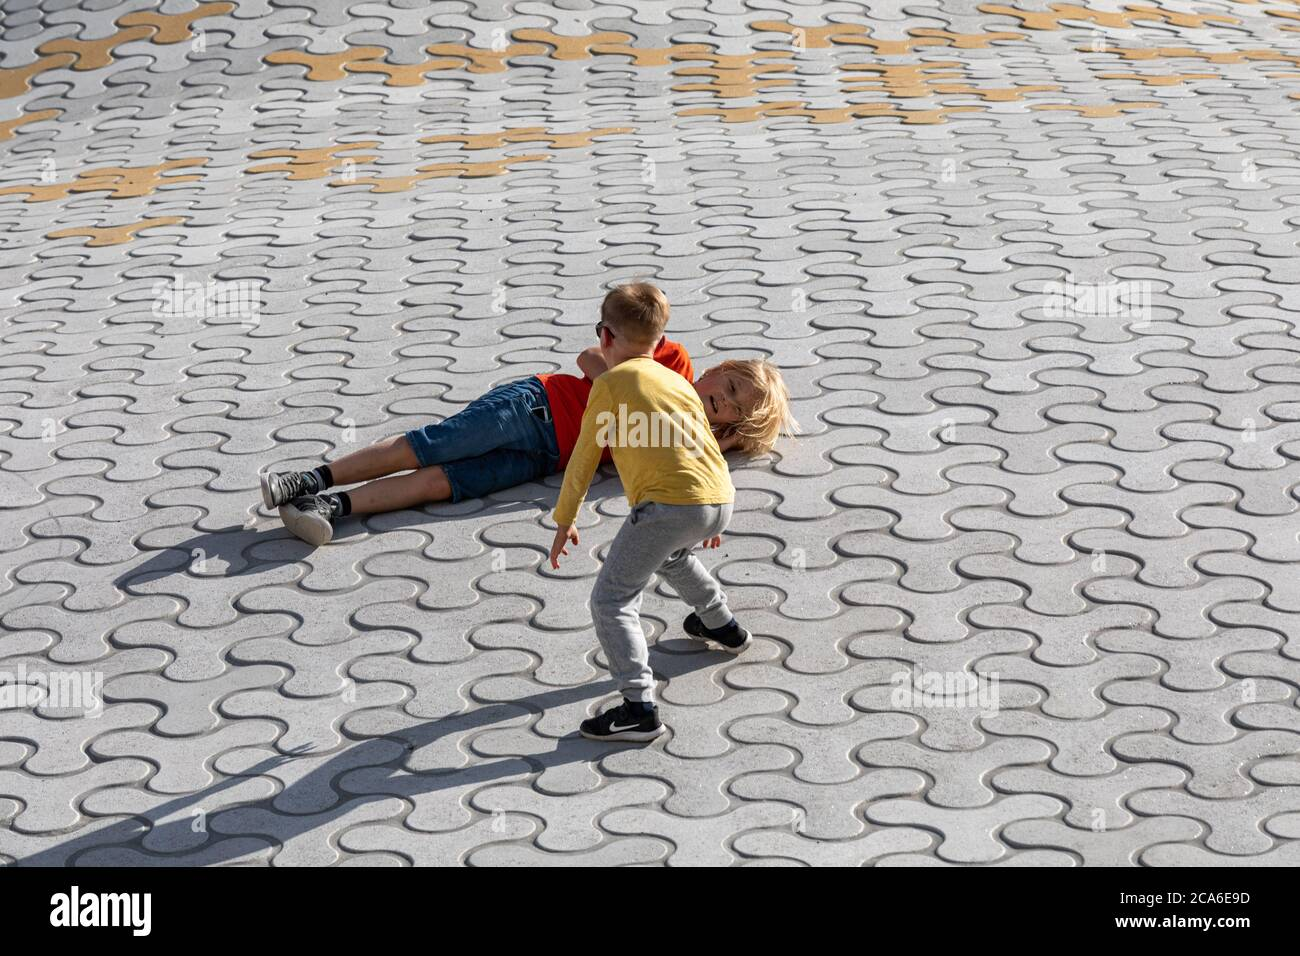 kids-fooling-around-on-amos-rex-skylight